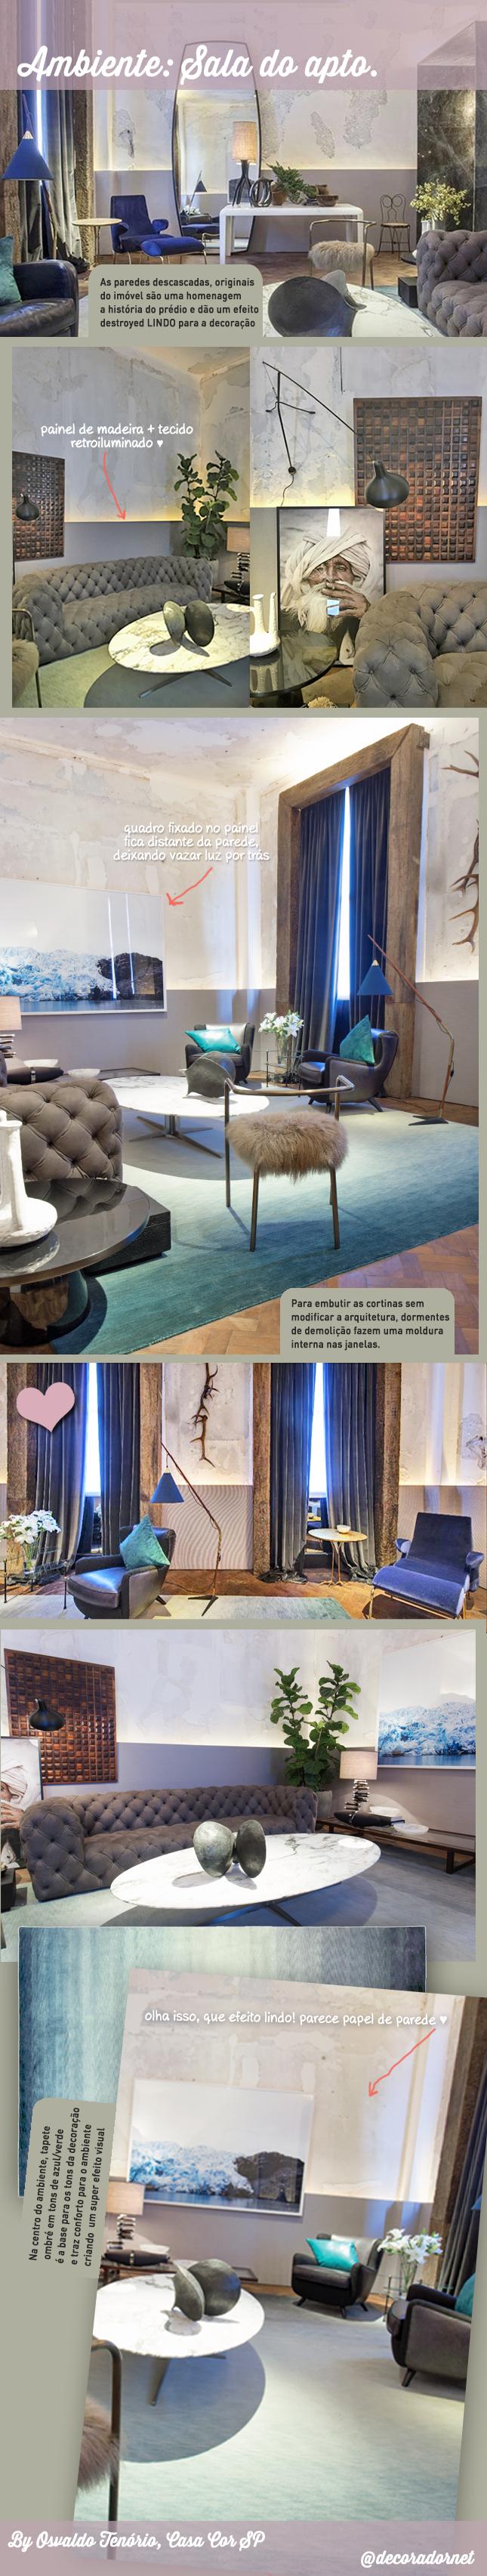 decoradornet-copyright-ambiente-casa-cor-14-06